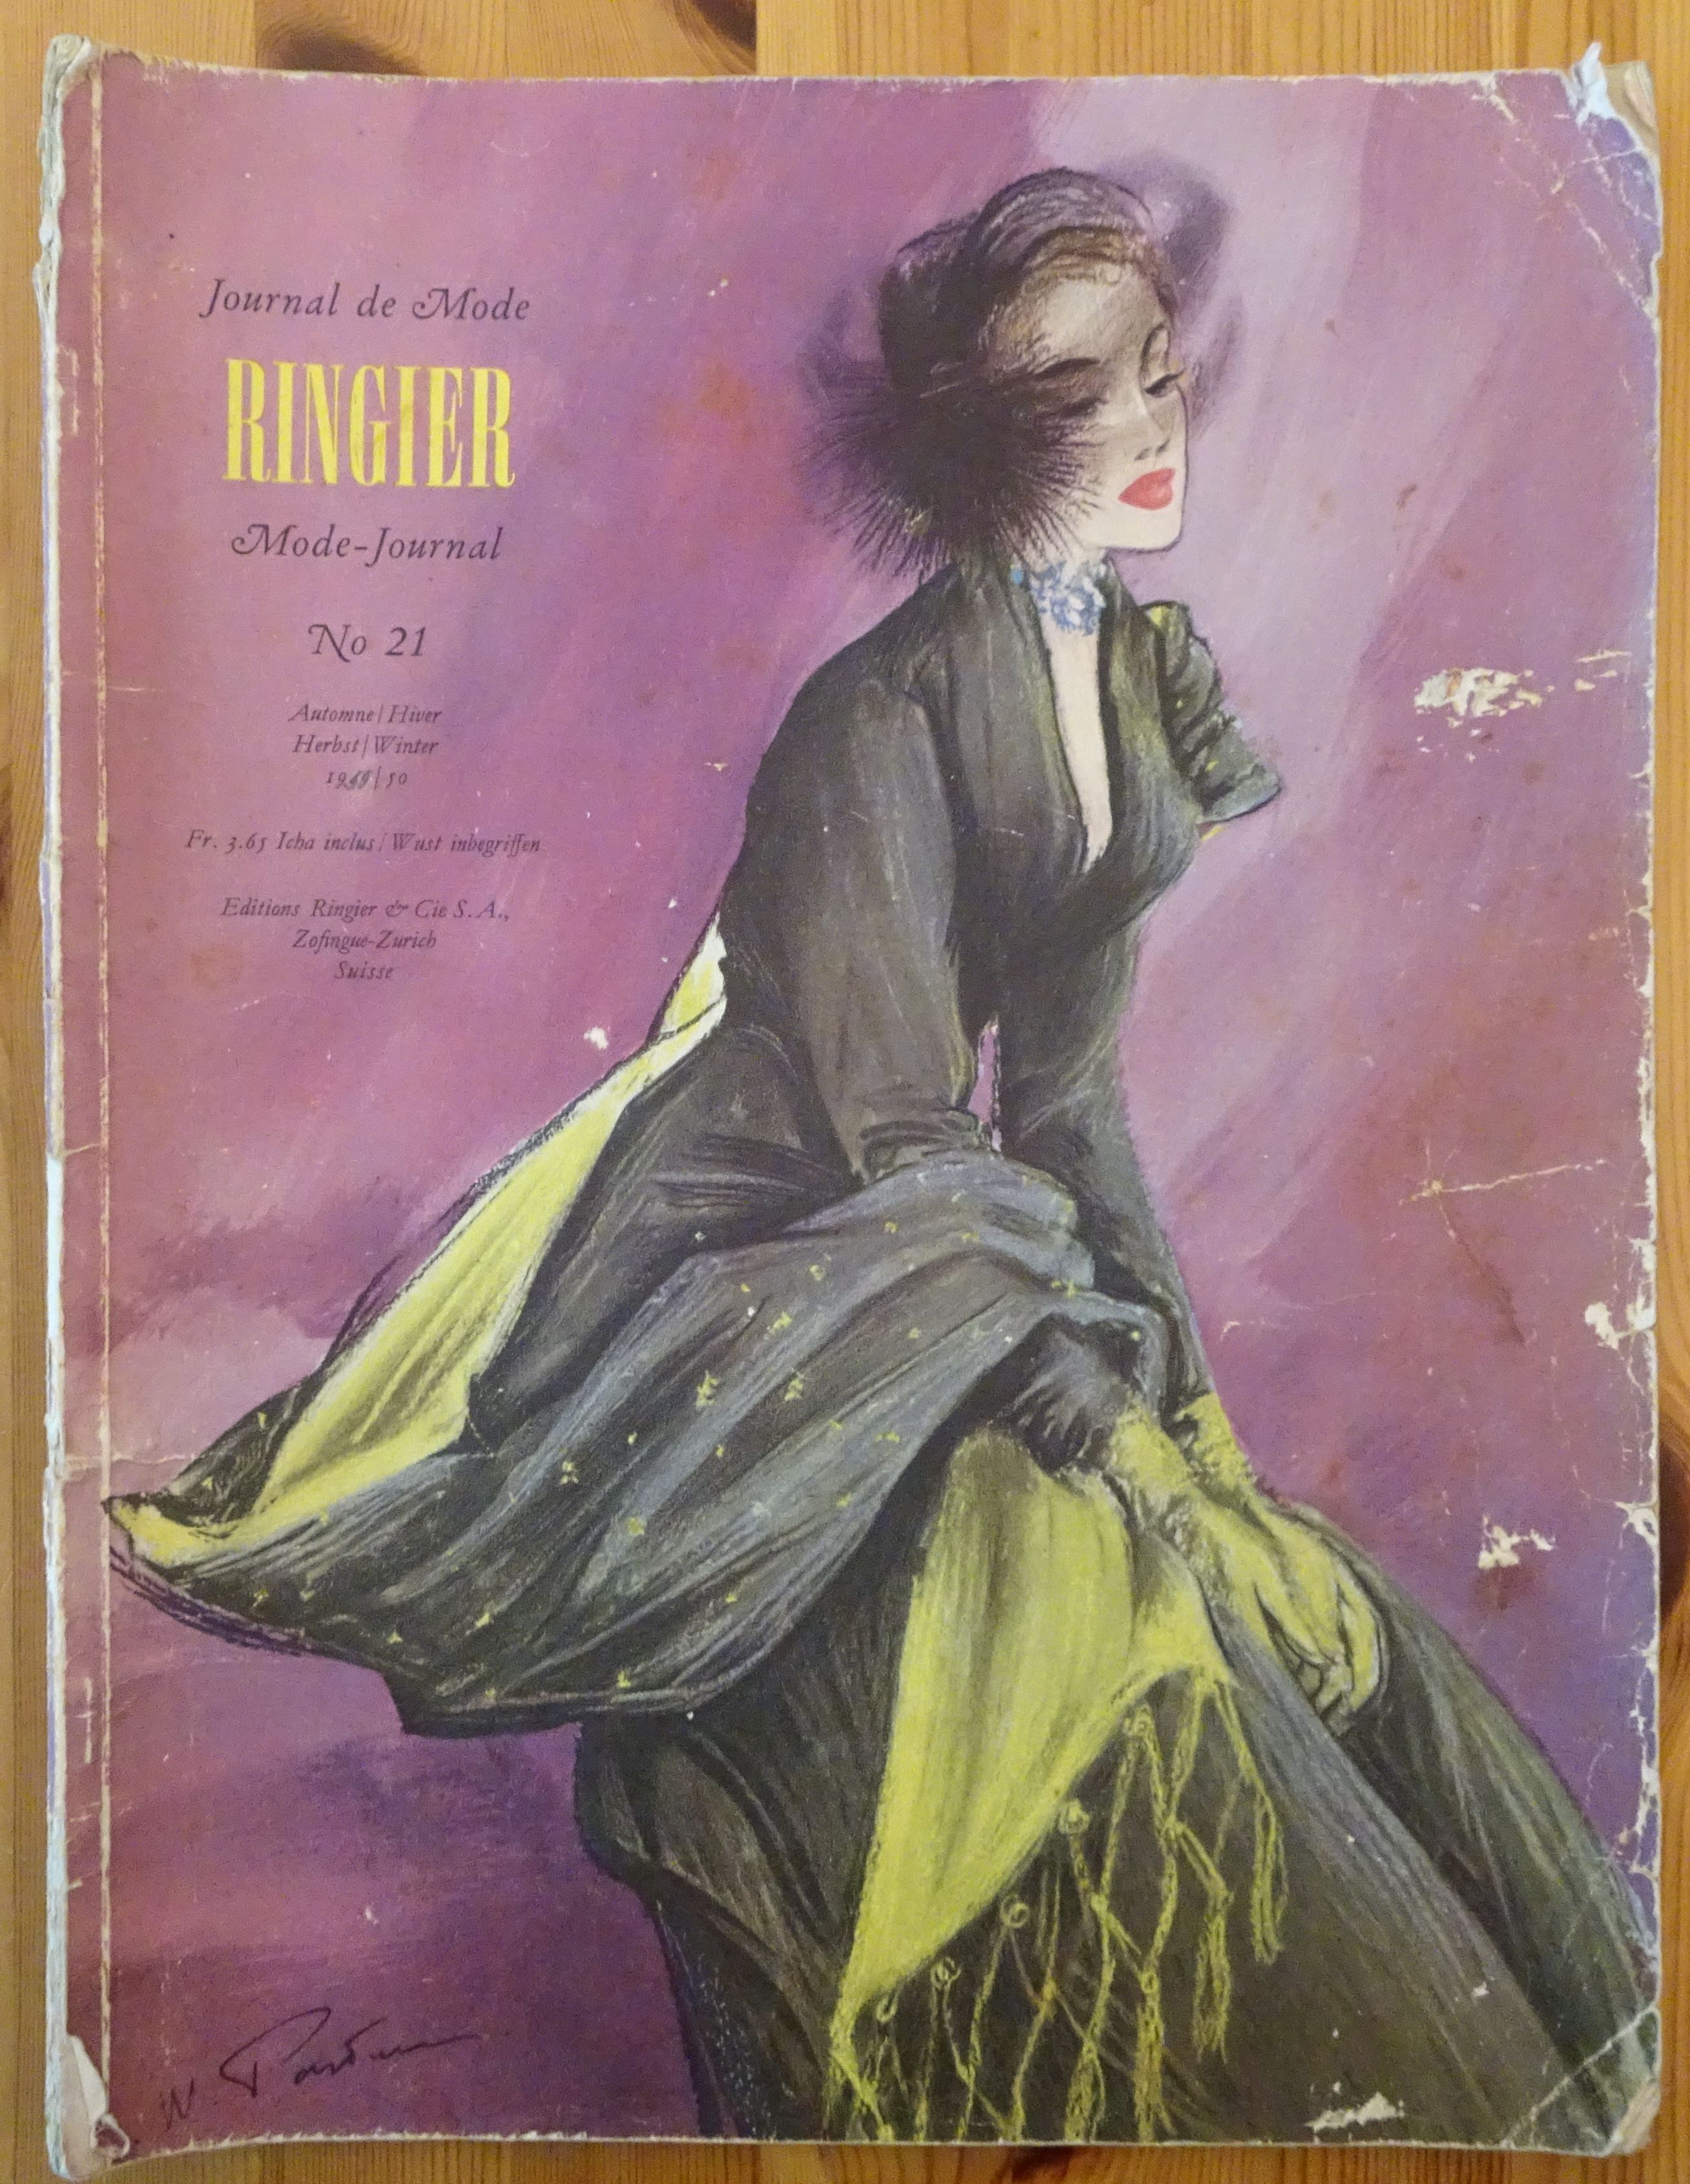 Ringier Journal de Mode Autumn/Winter 1949/50